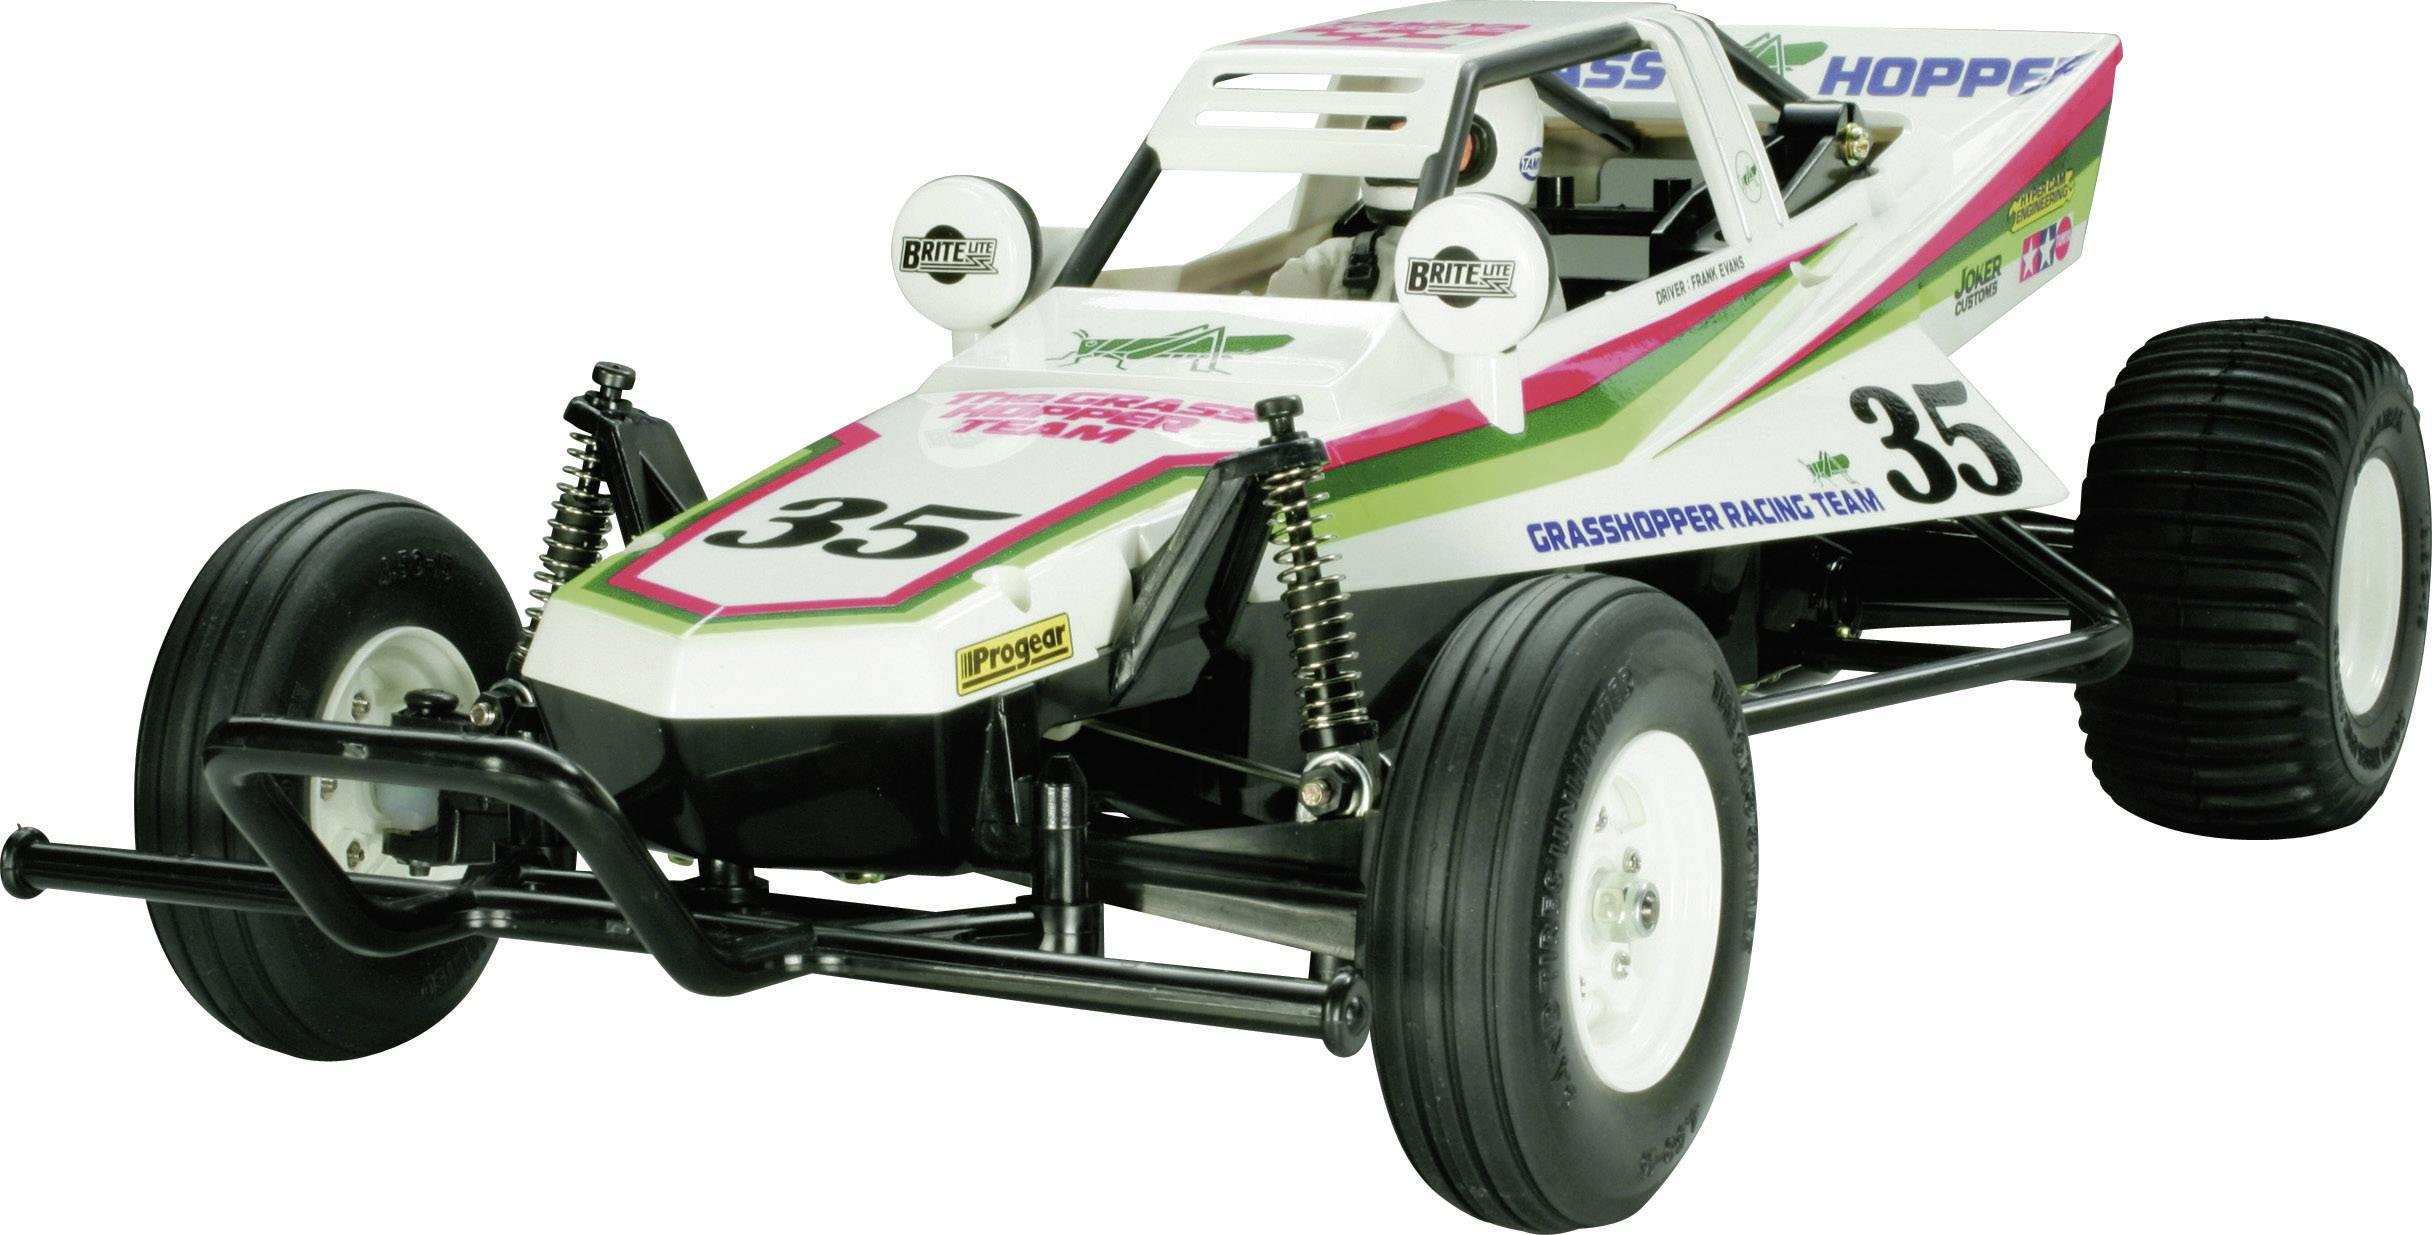 RC model auta Buggy Tamiya Grasshopper I, komutátorový, 1:10, zadní 2WD (4x2), stavebnice